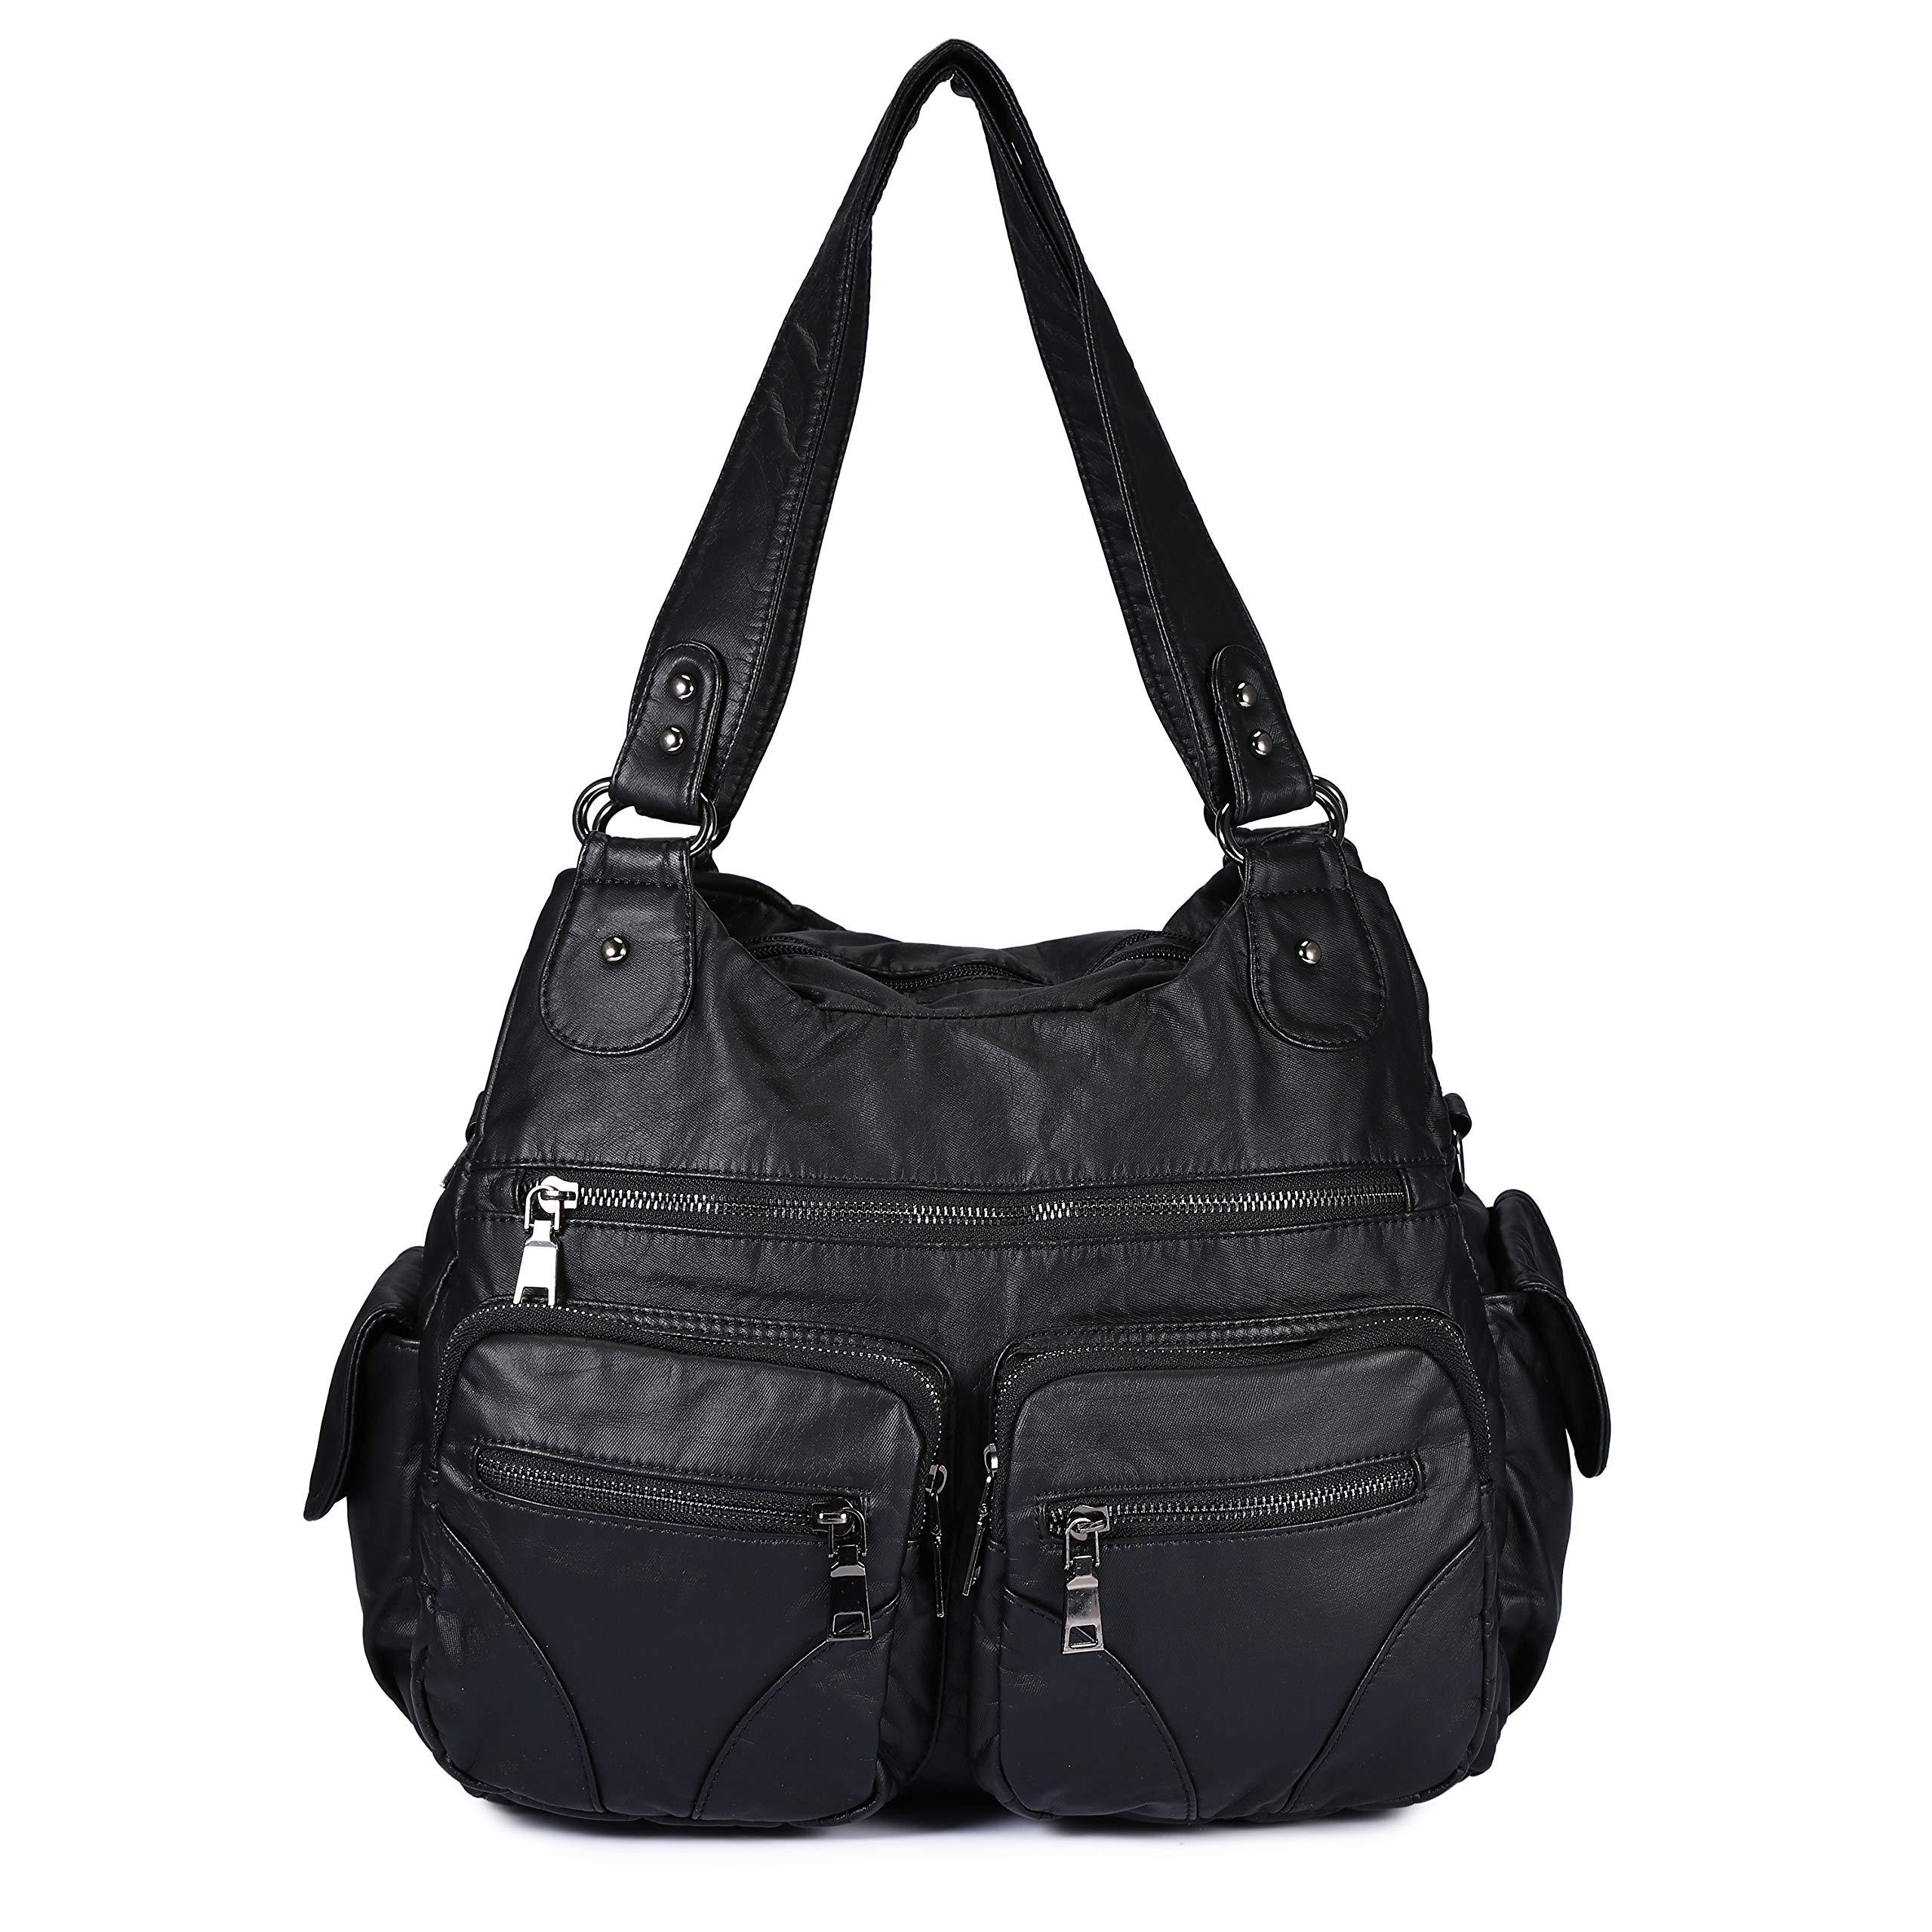 Women Handbag Soft Leather Purse Large Capacity Tote Bag Crossbody Shoulder Bag for Ladies